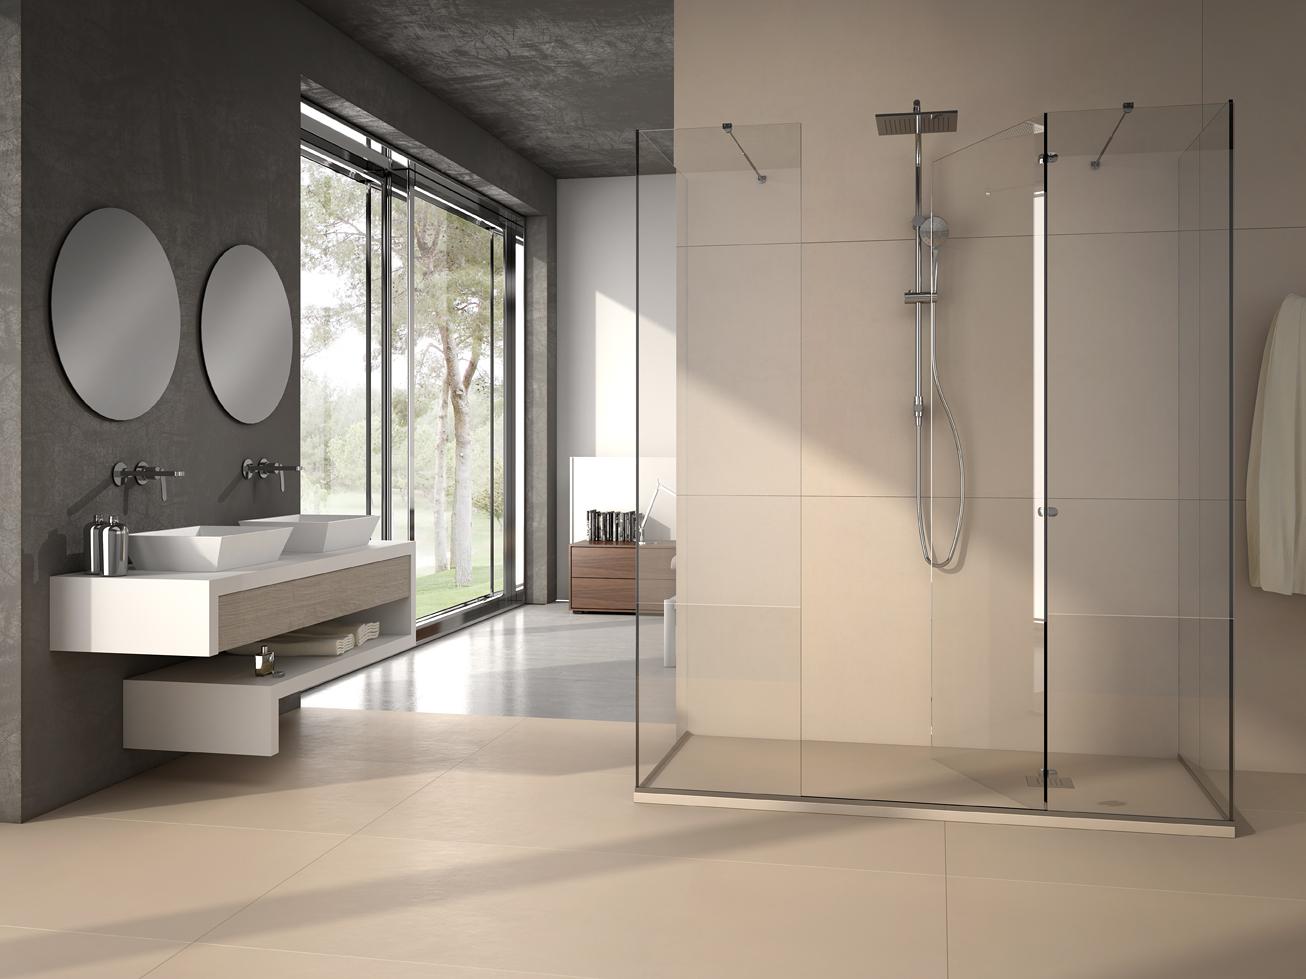 Plato de ducha esencial 4 panelpiedramadrid for Platos de ducha ceramicos rectangulares